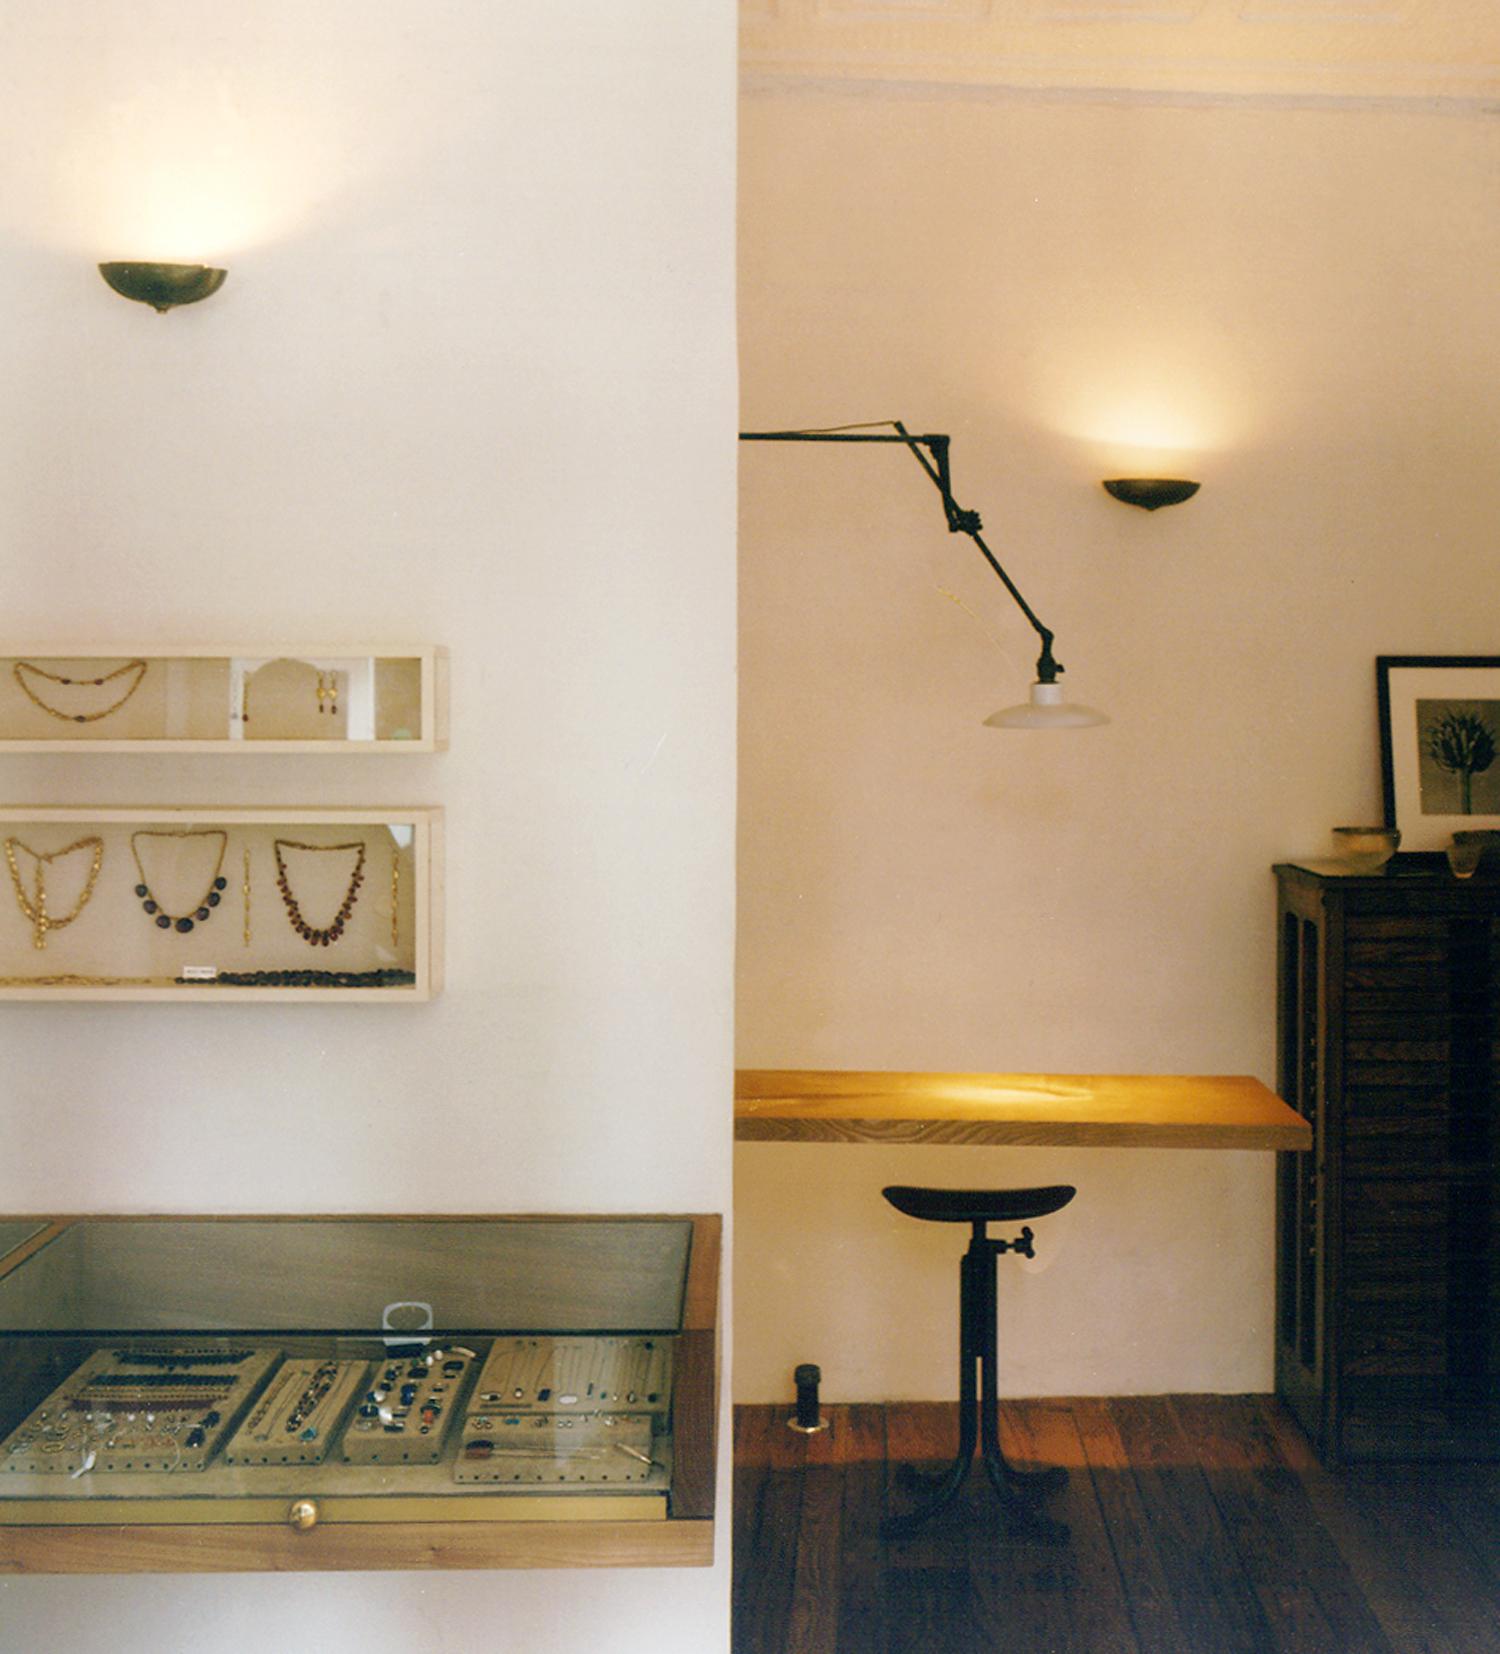 Steven Alan  : The Borealis Jewelry Shop